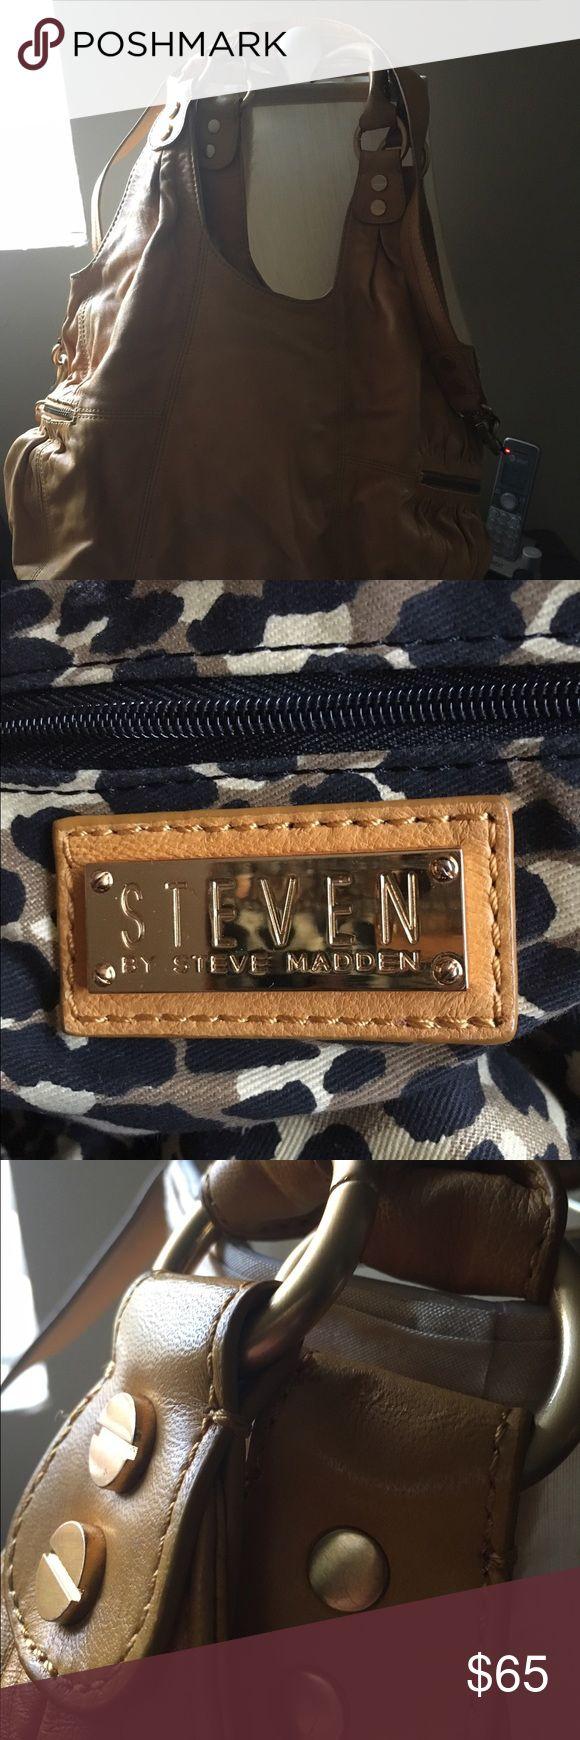 Beatiful Steve Madden Handbag! Steven( Steve Madden), used, Normal Wear, beautiful Color Steve Madden Bags Totes